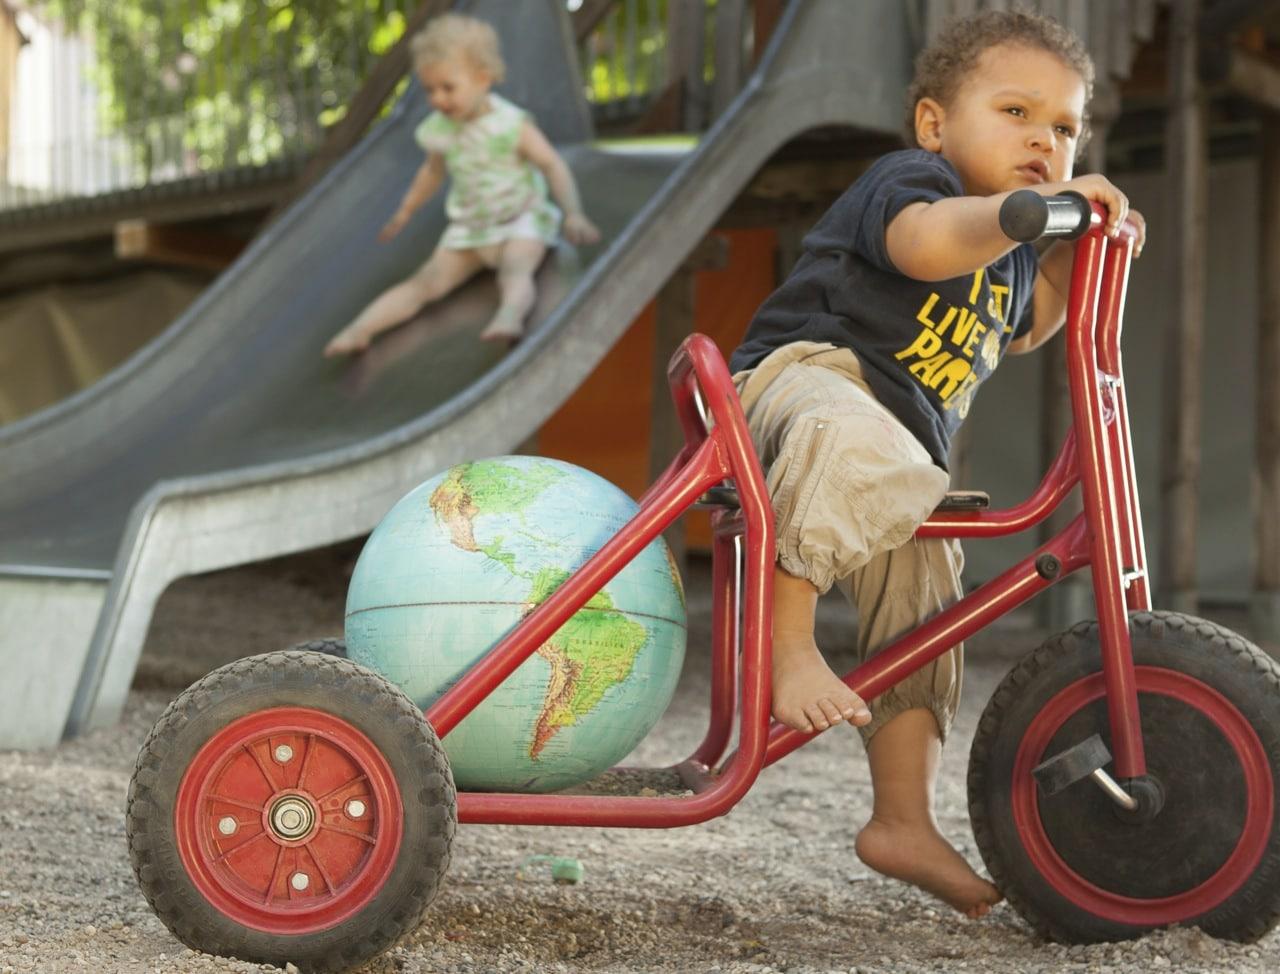 Epigenetics offer hope for disadvantaged children